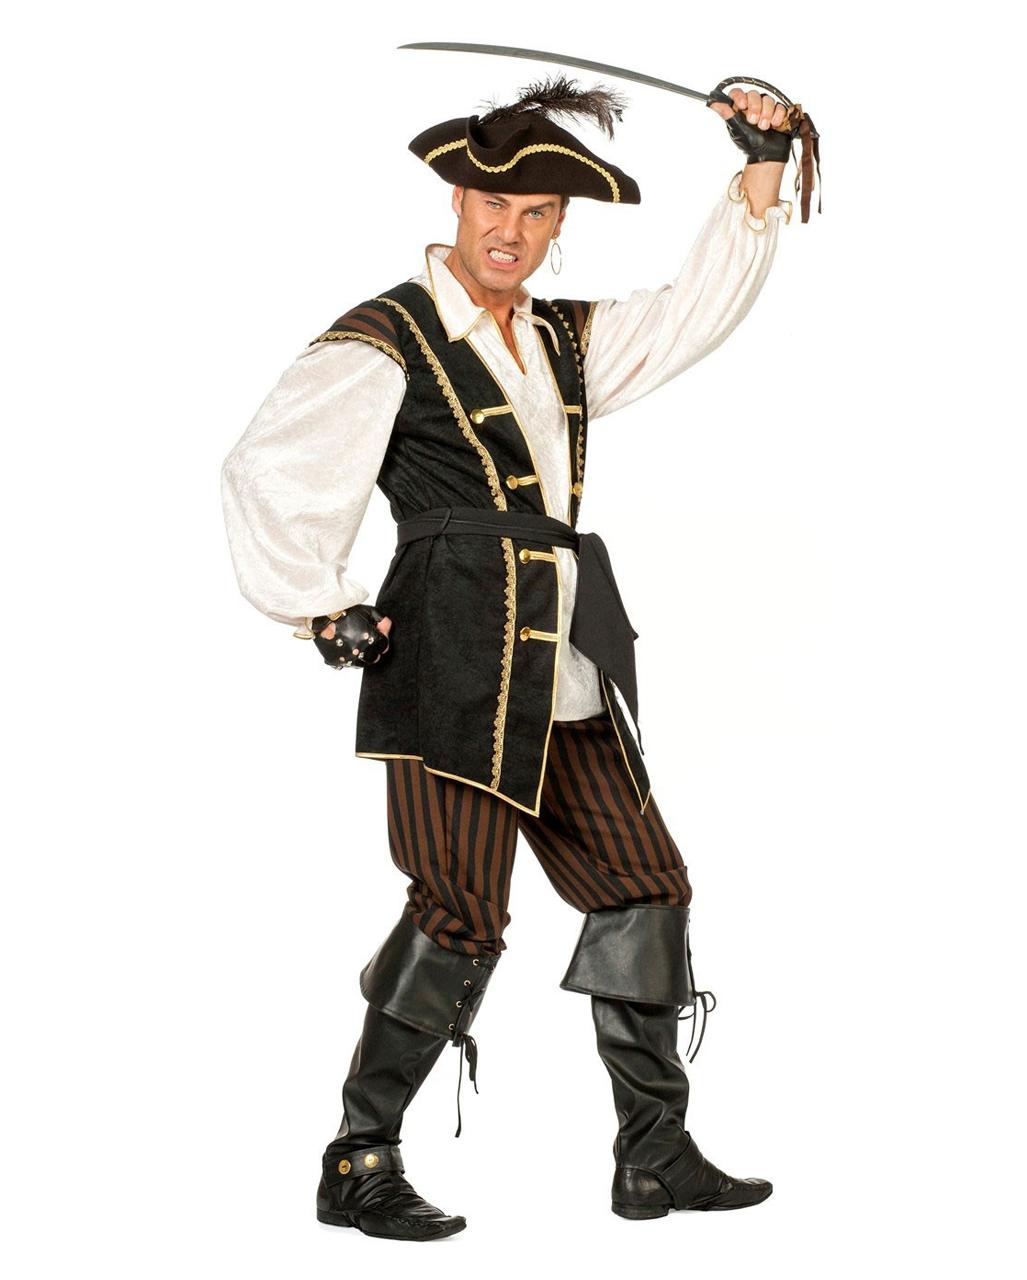 piraten commander herren kost m f r karneval kaufen. Black Bedroom Furniture Sets. Home Design Ideas